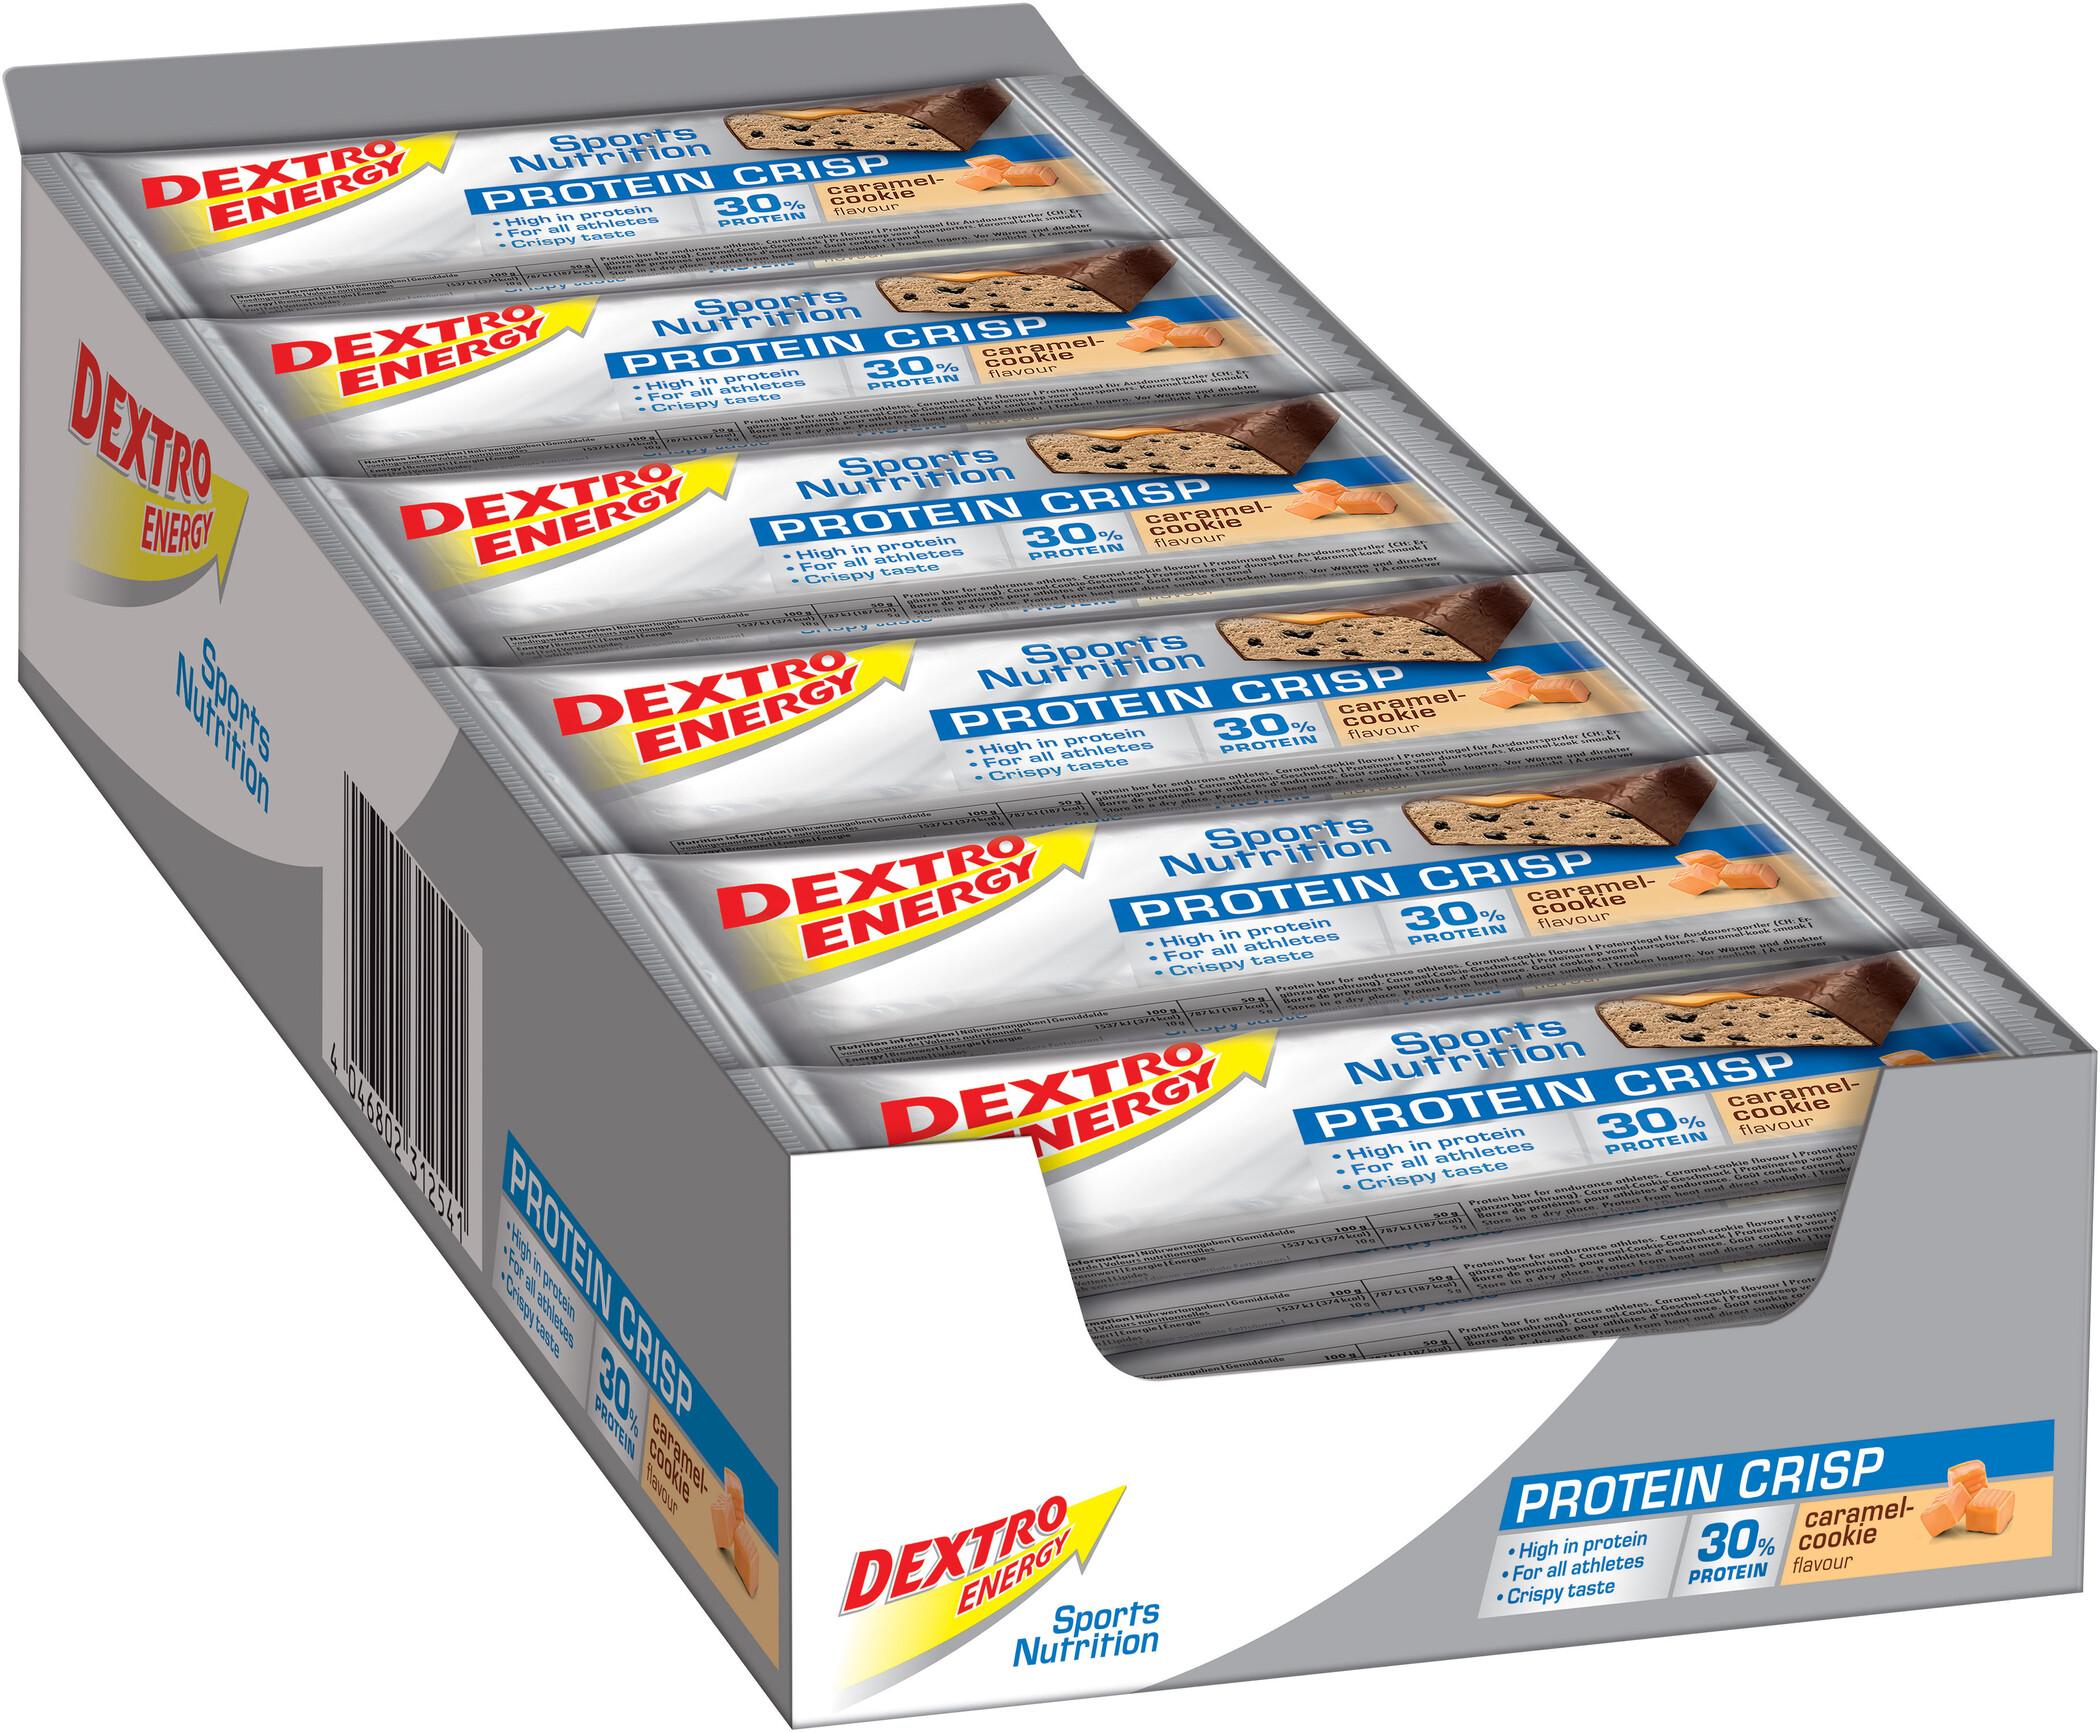 Dextro Energy Protein Crisp Box 24x50g, Caramel-Cookies (2019) | Protein bar and powder